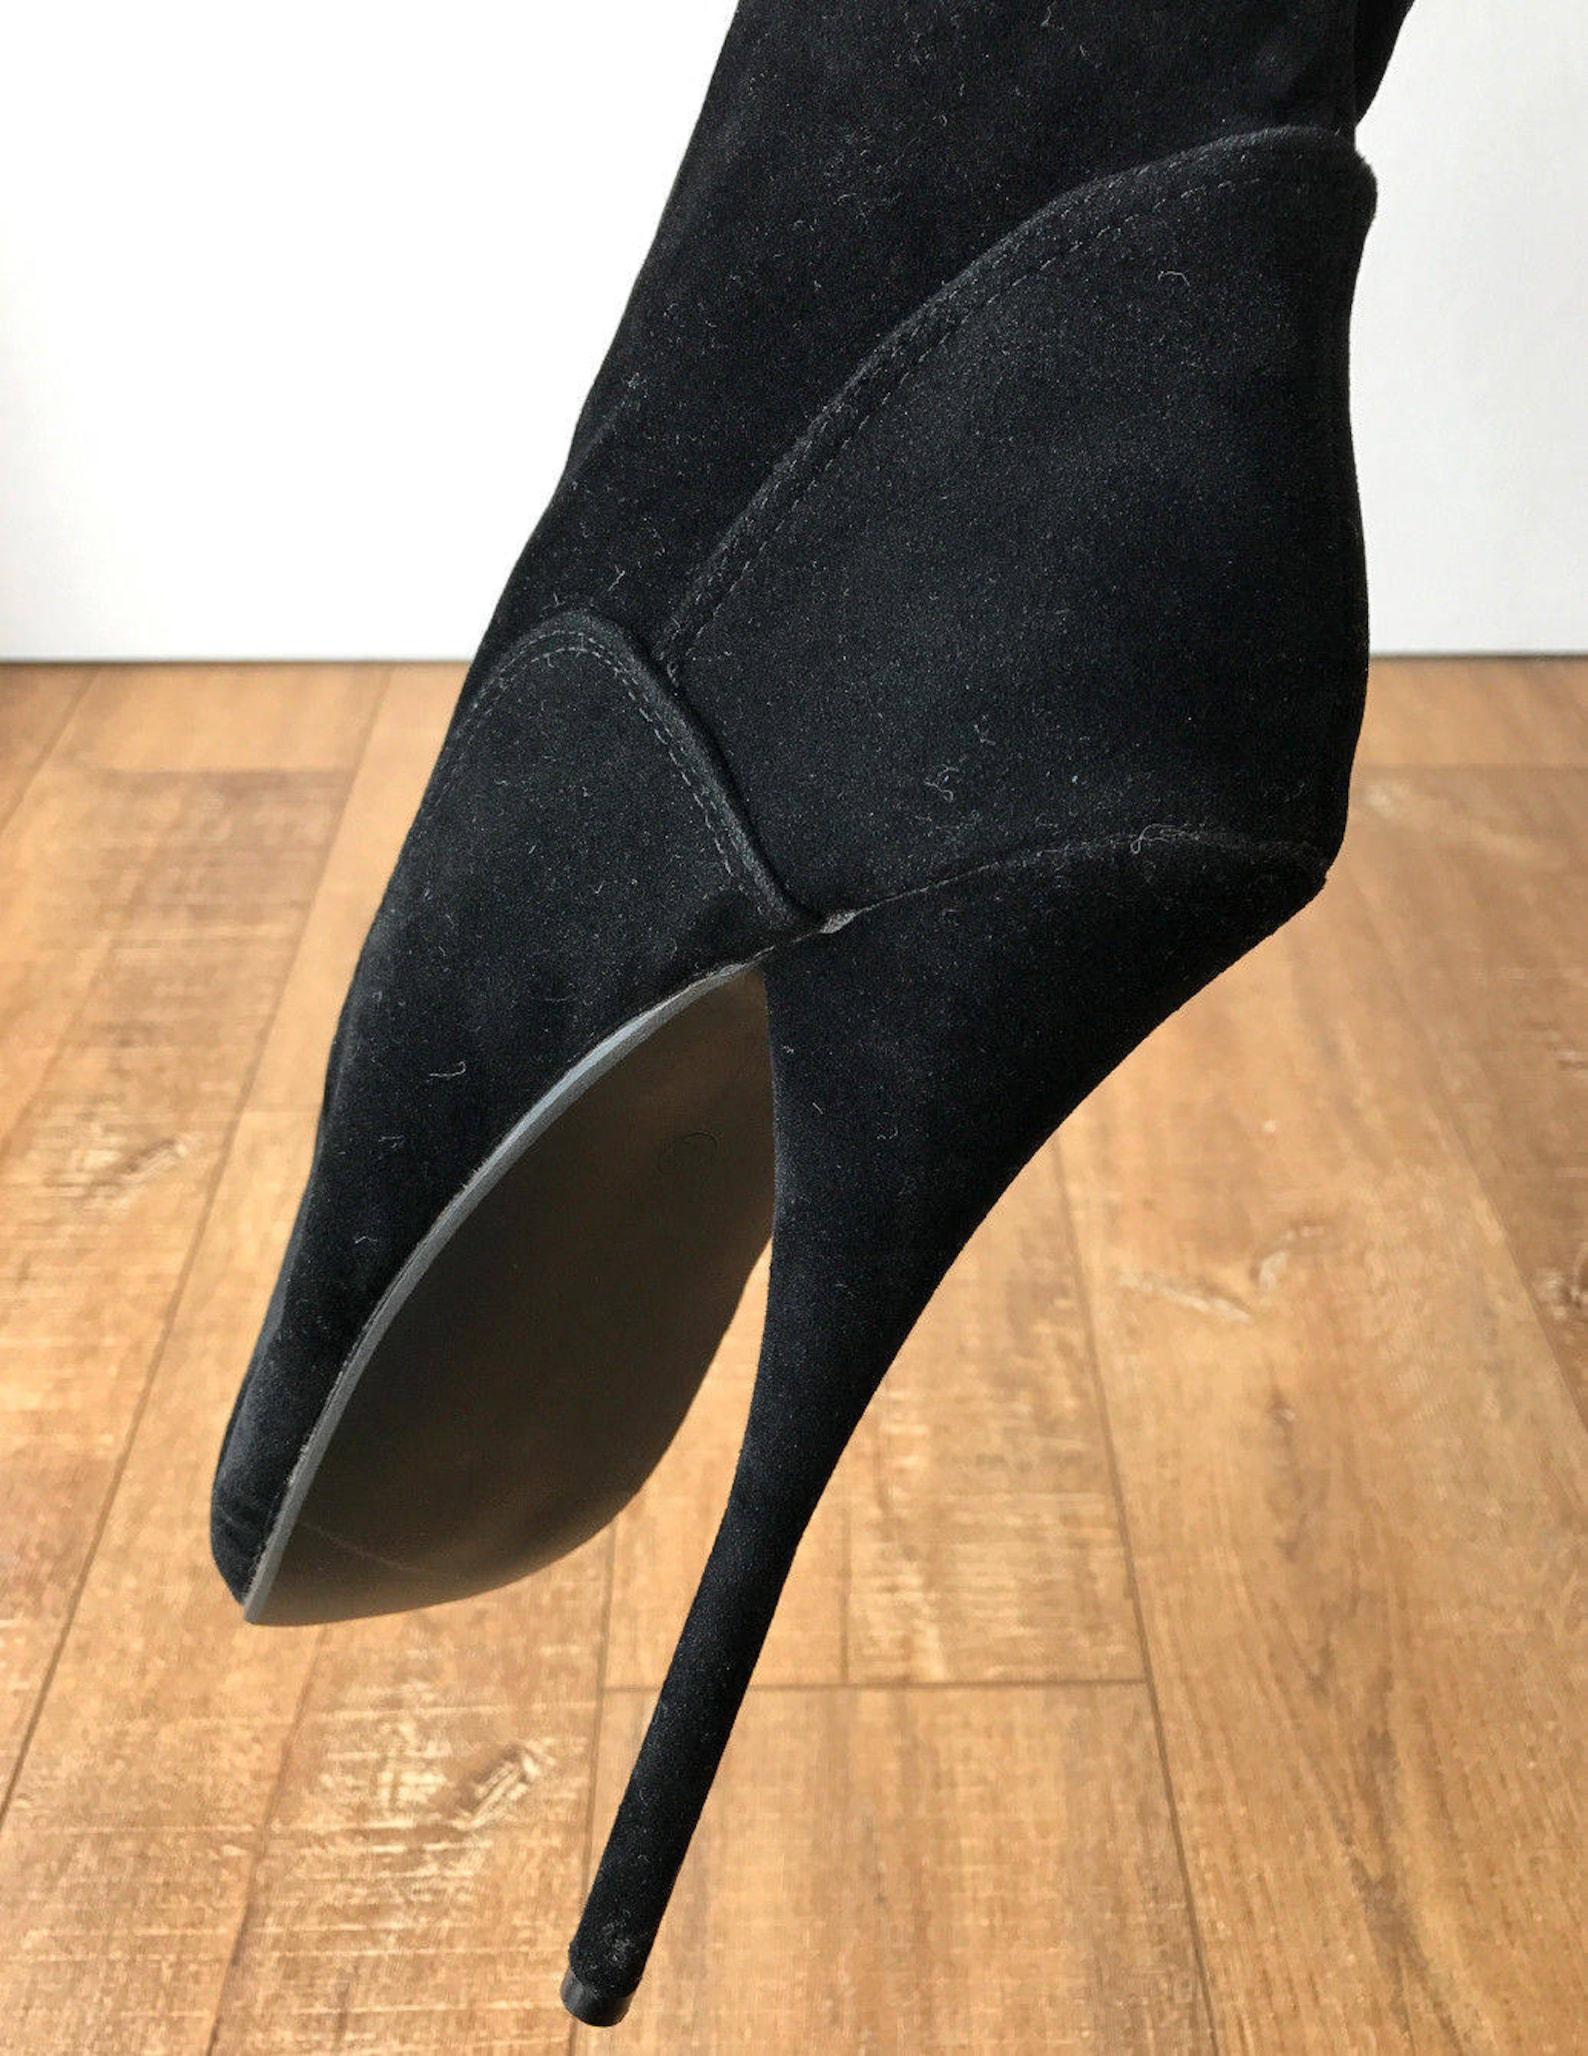 rtbu ezra narrow tongue 70cm crotch ballet stiletto custom order black suede